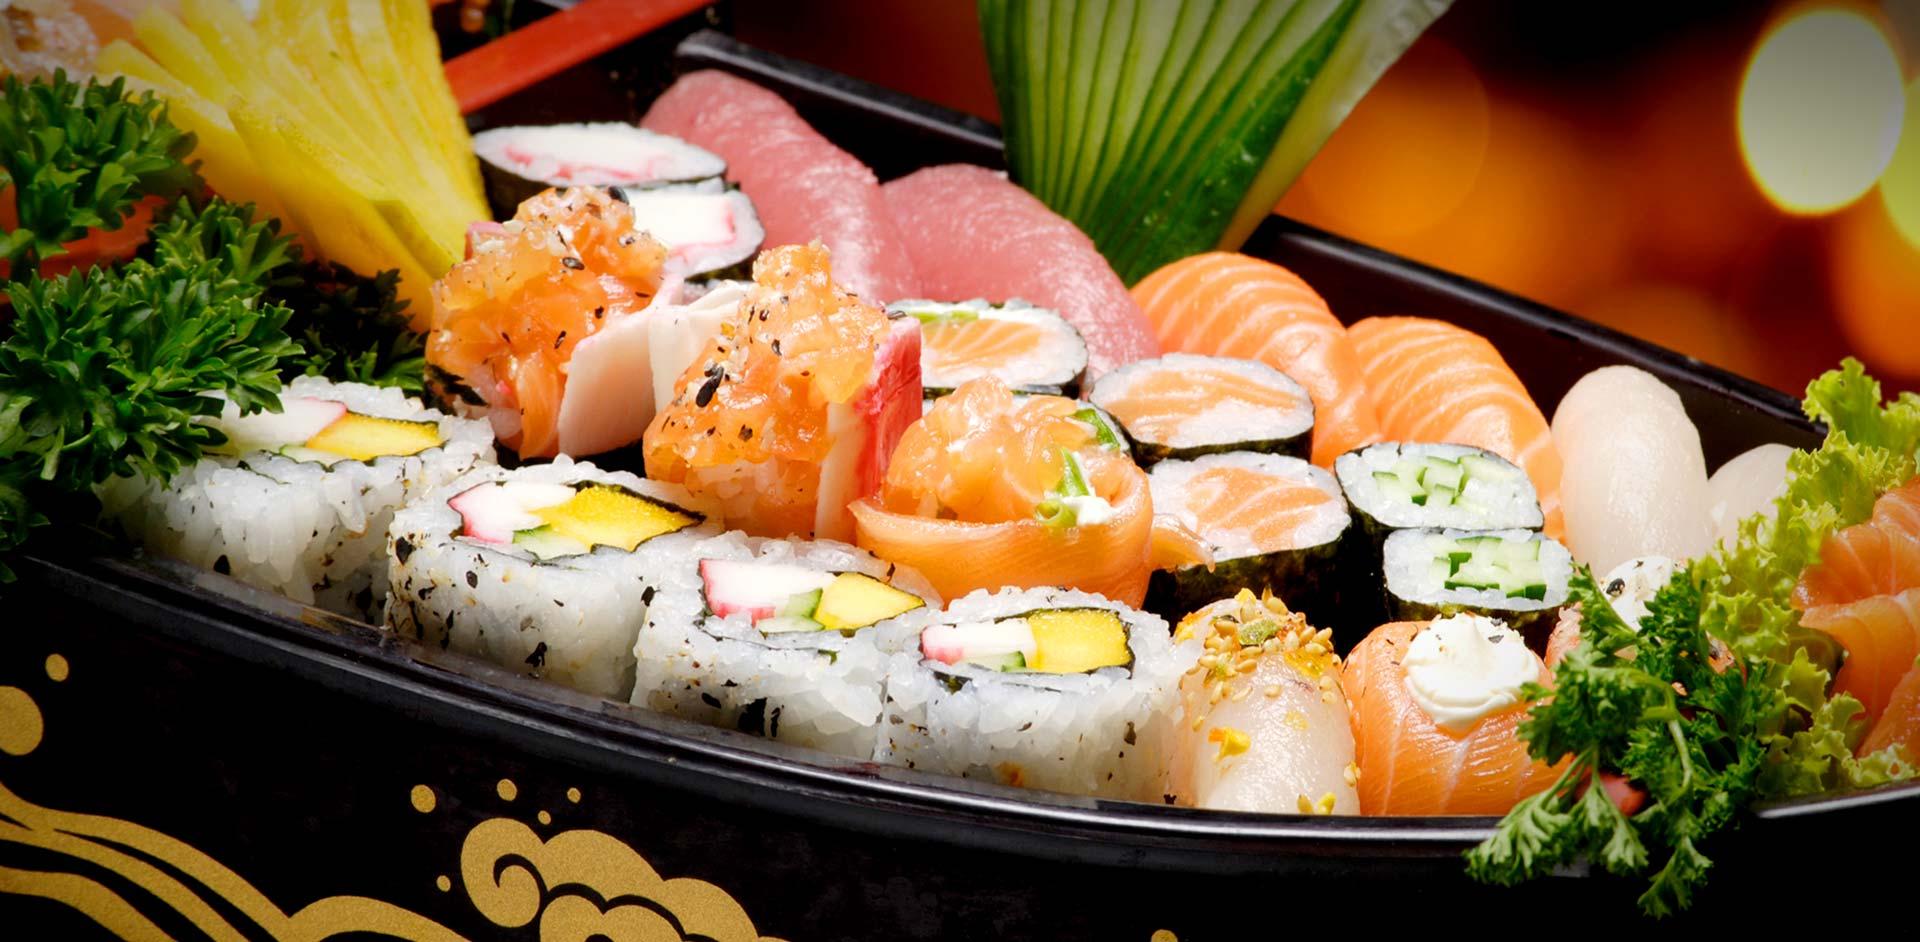 http://images6.fanpop.com/image/photos/38800000/-Beautiful-Sushi-sushi-38873156-1920-942.jpg